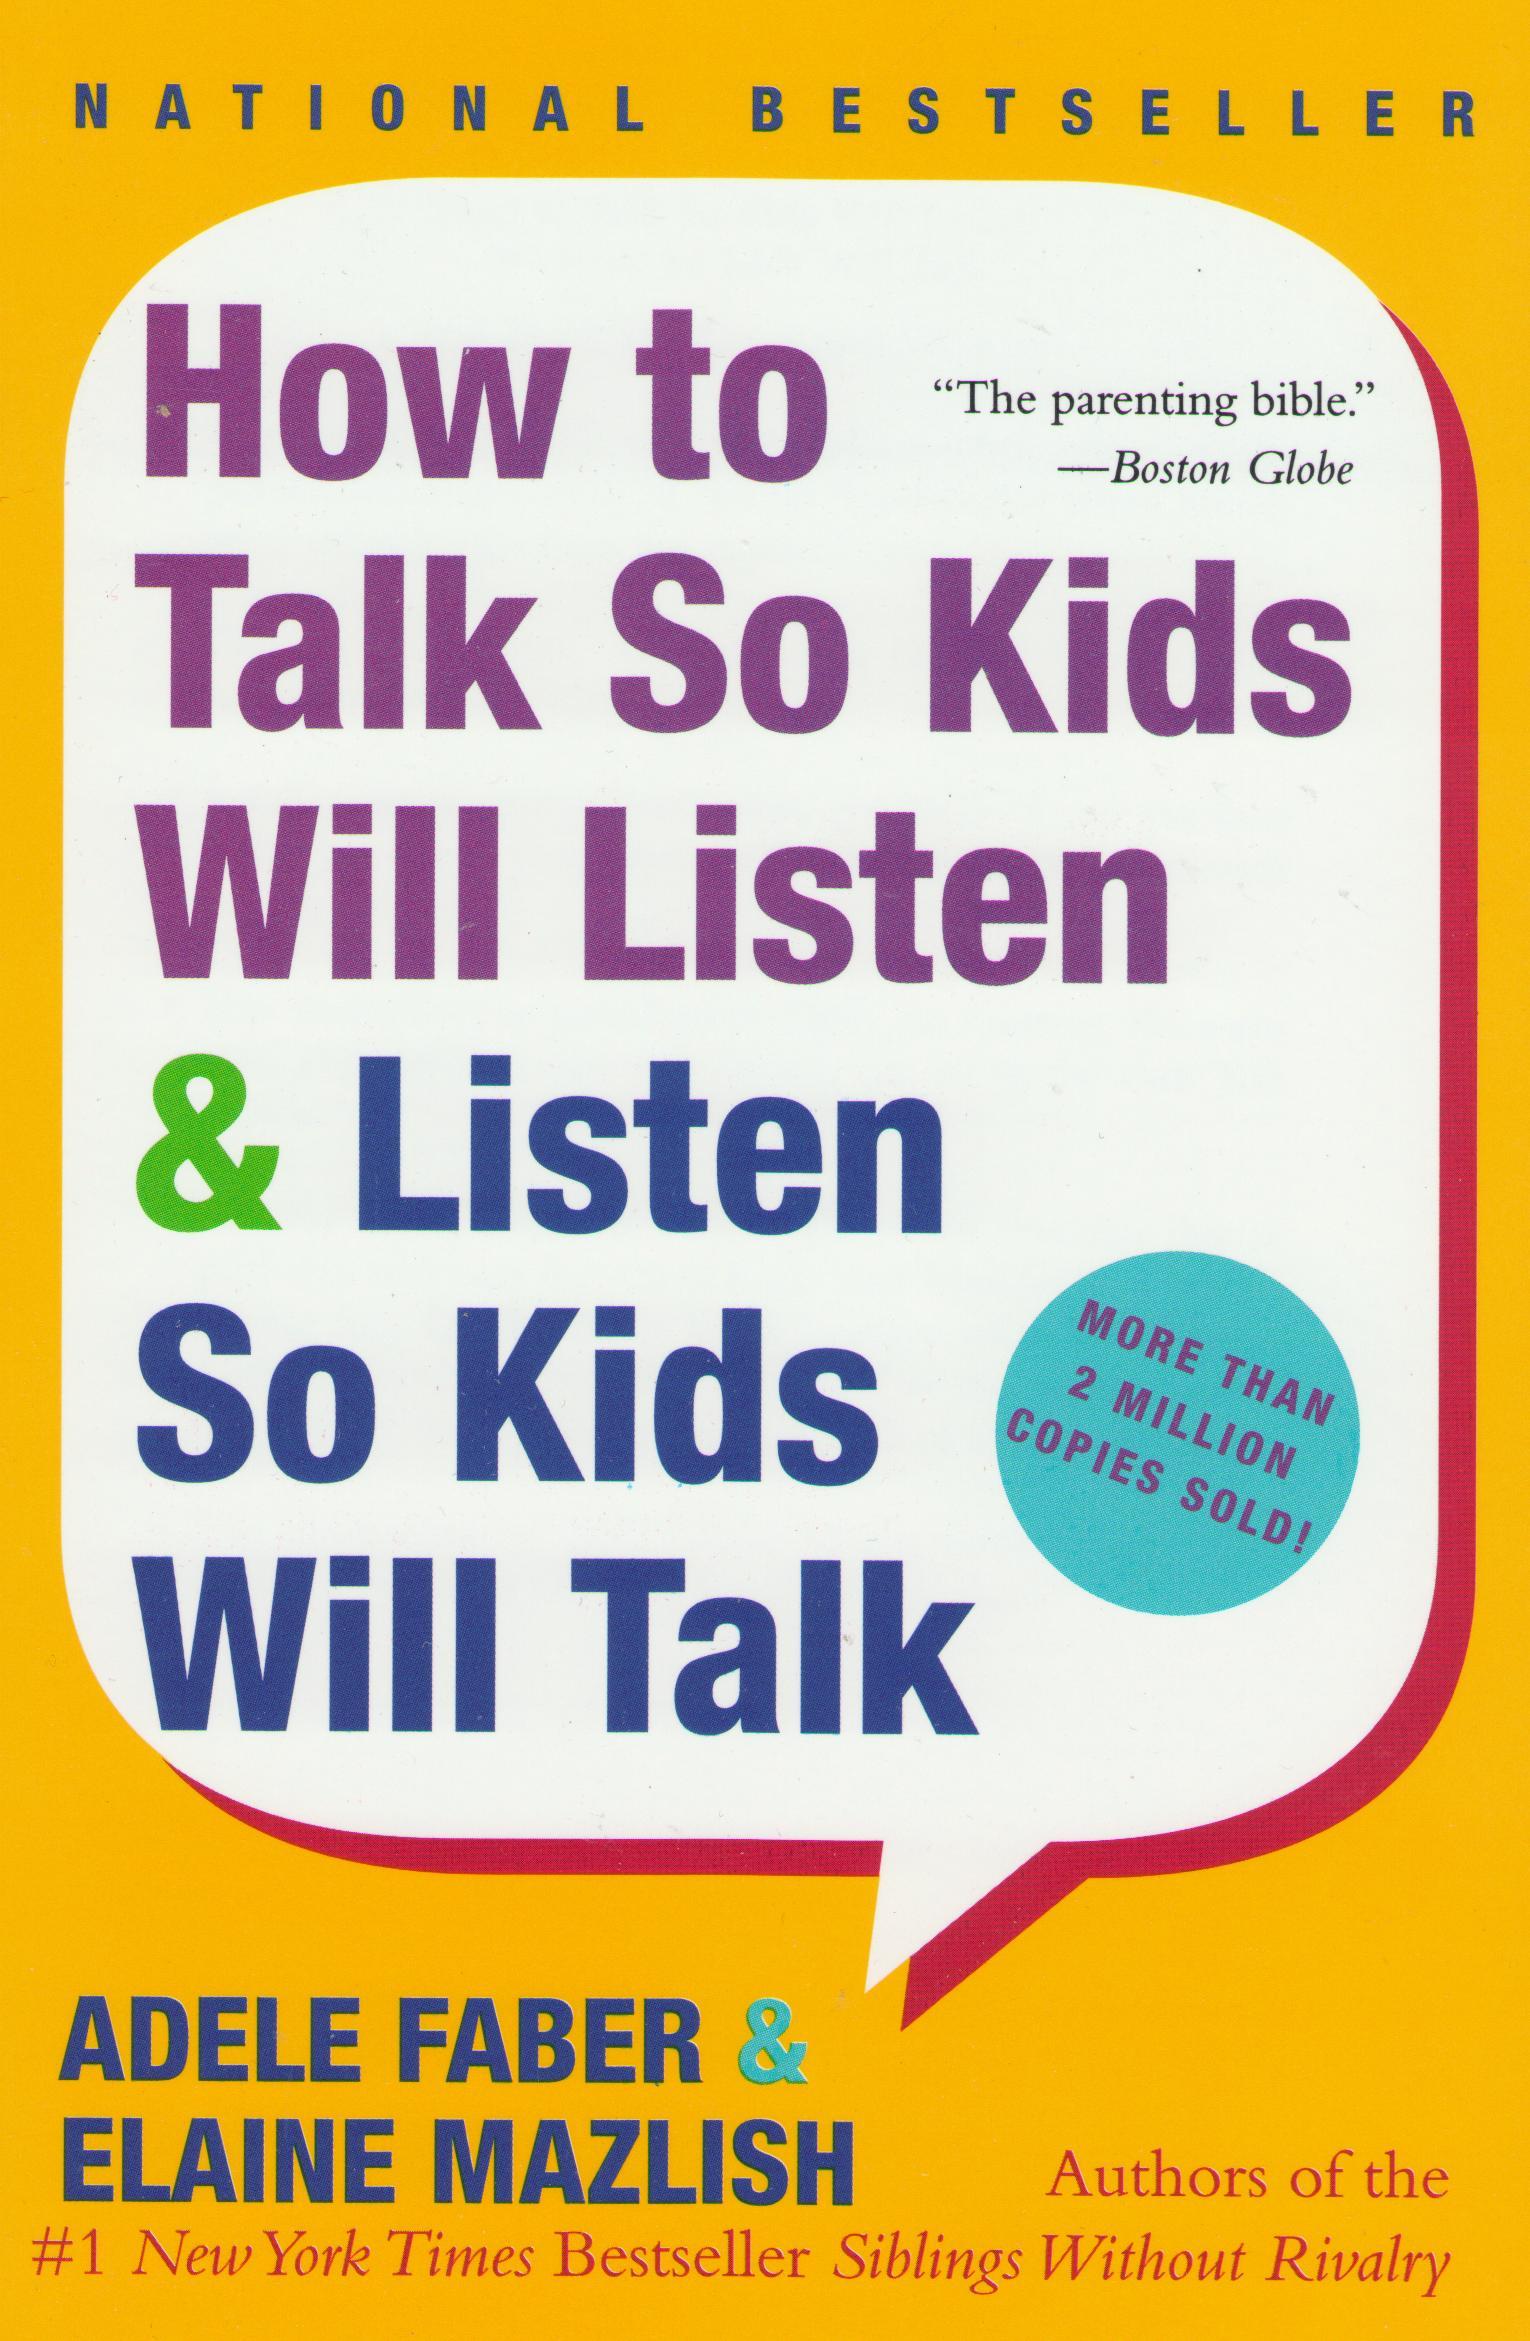 How to Talk So Kids Will Listen and Listen So Kids Will Talk Summary